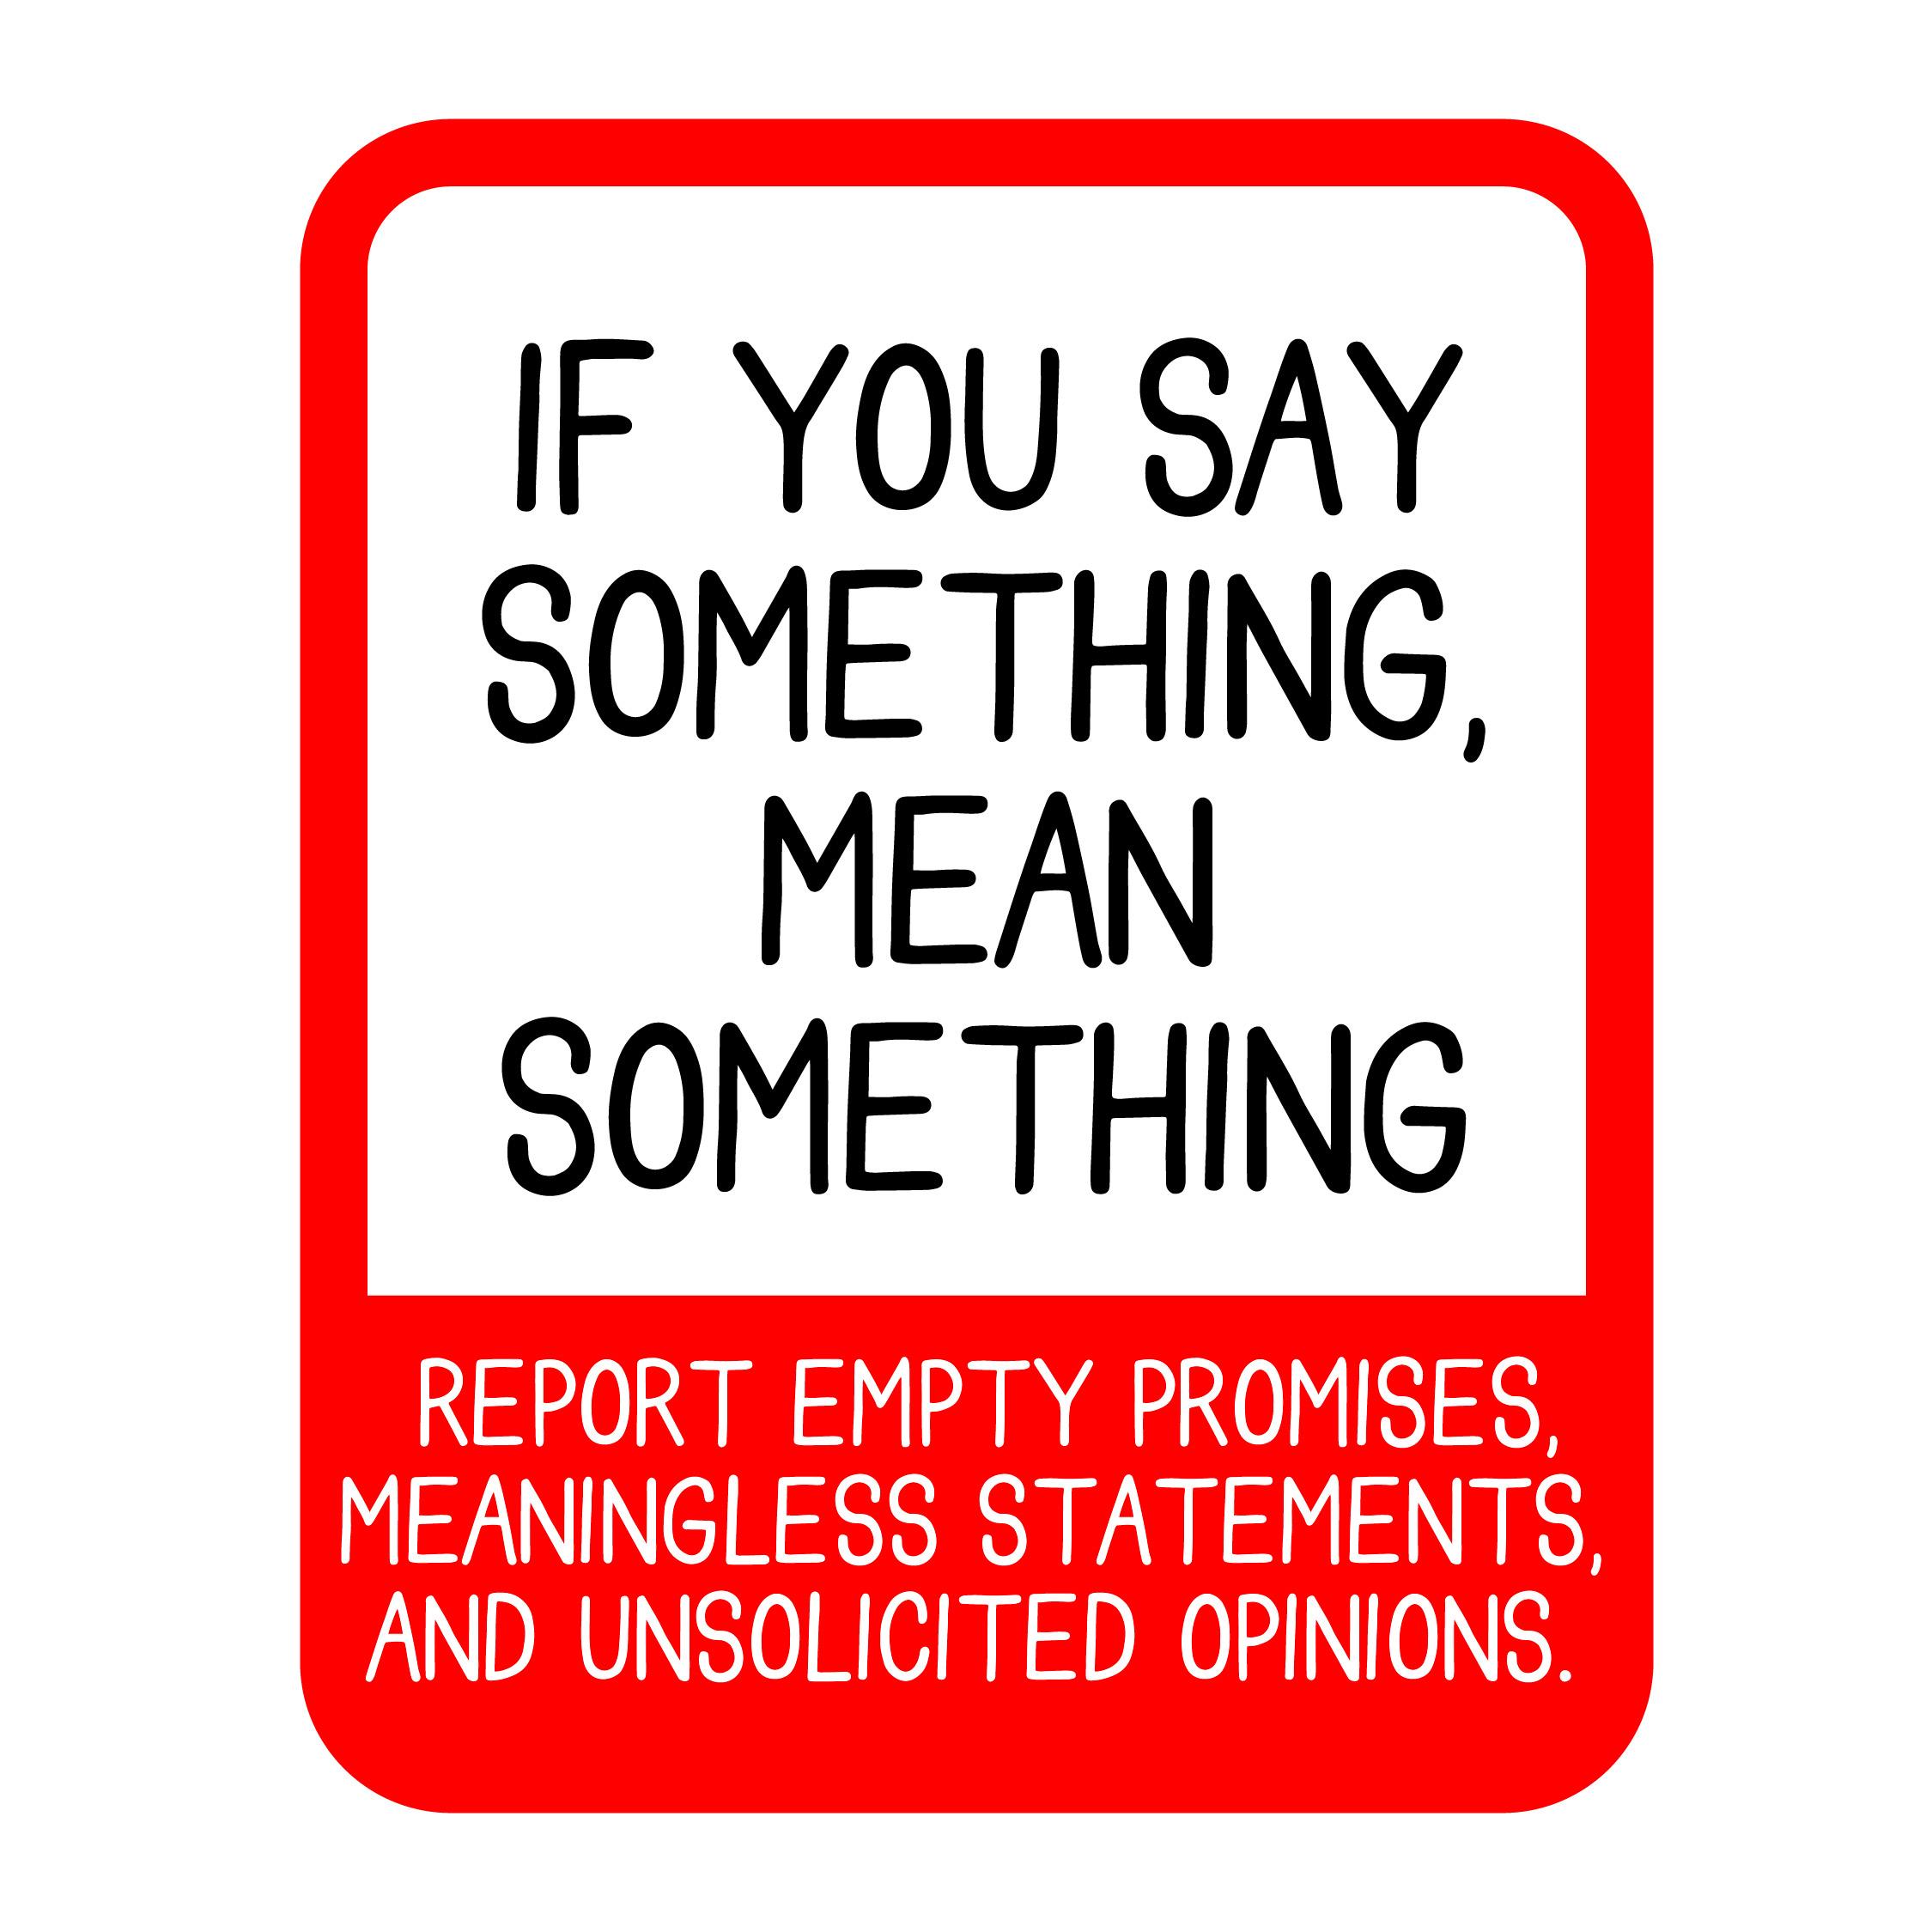 saysomethingmeansomething-01.jpg